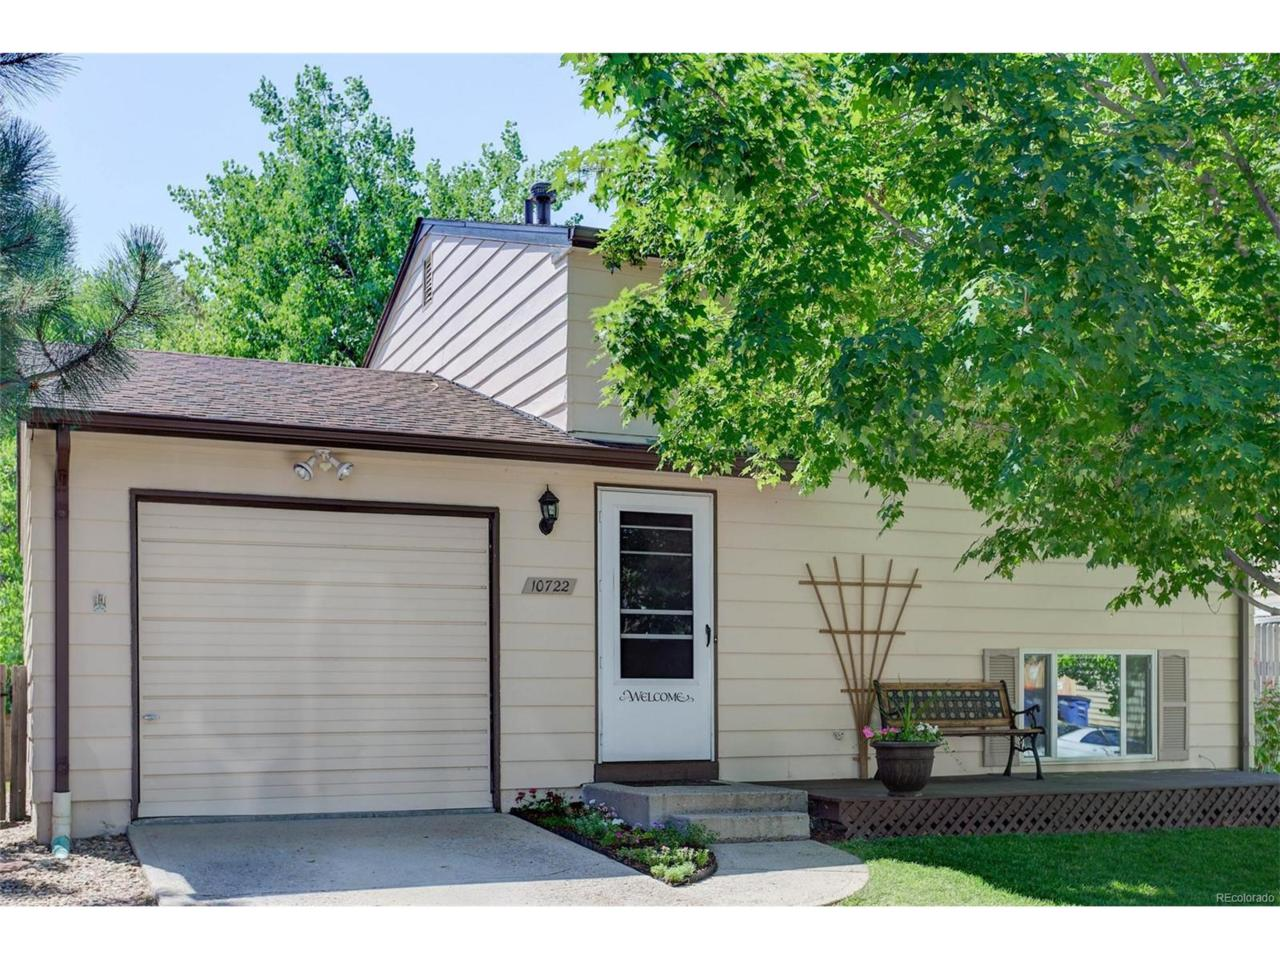 10722 Moore Way, Westminster, CO 80021 (MLS #3368283) :: 8z Real Estate